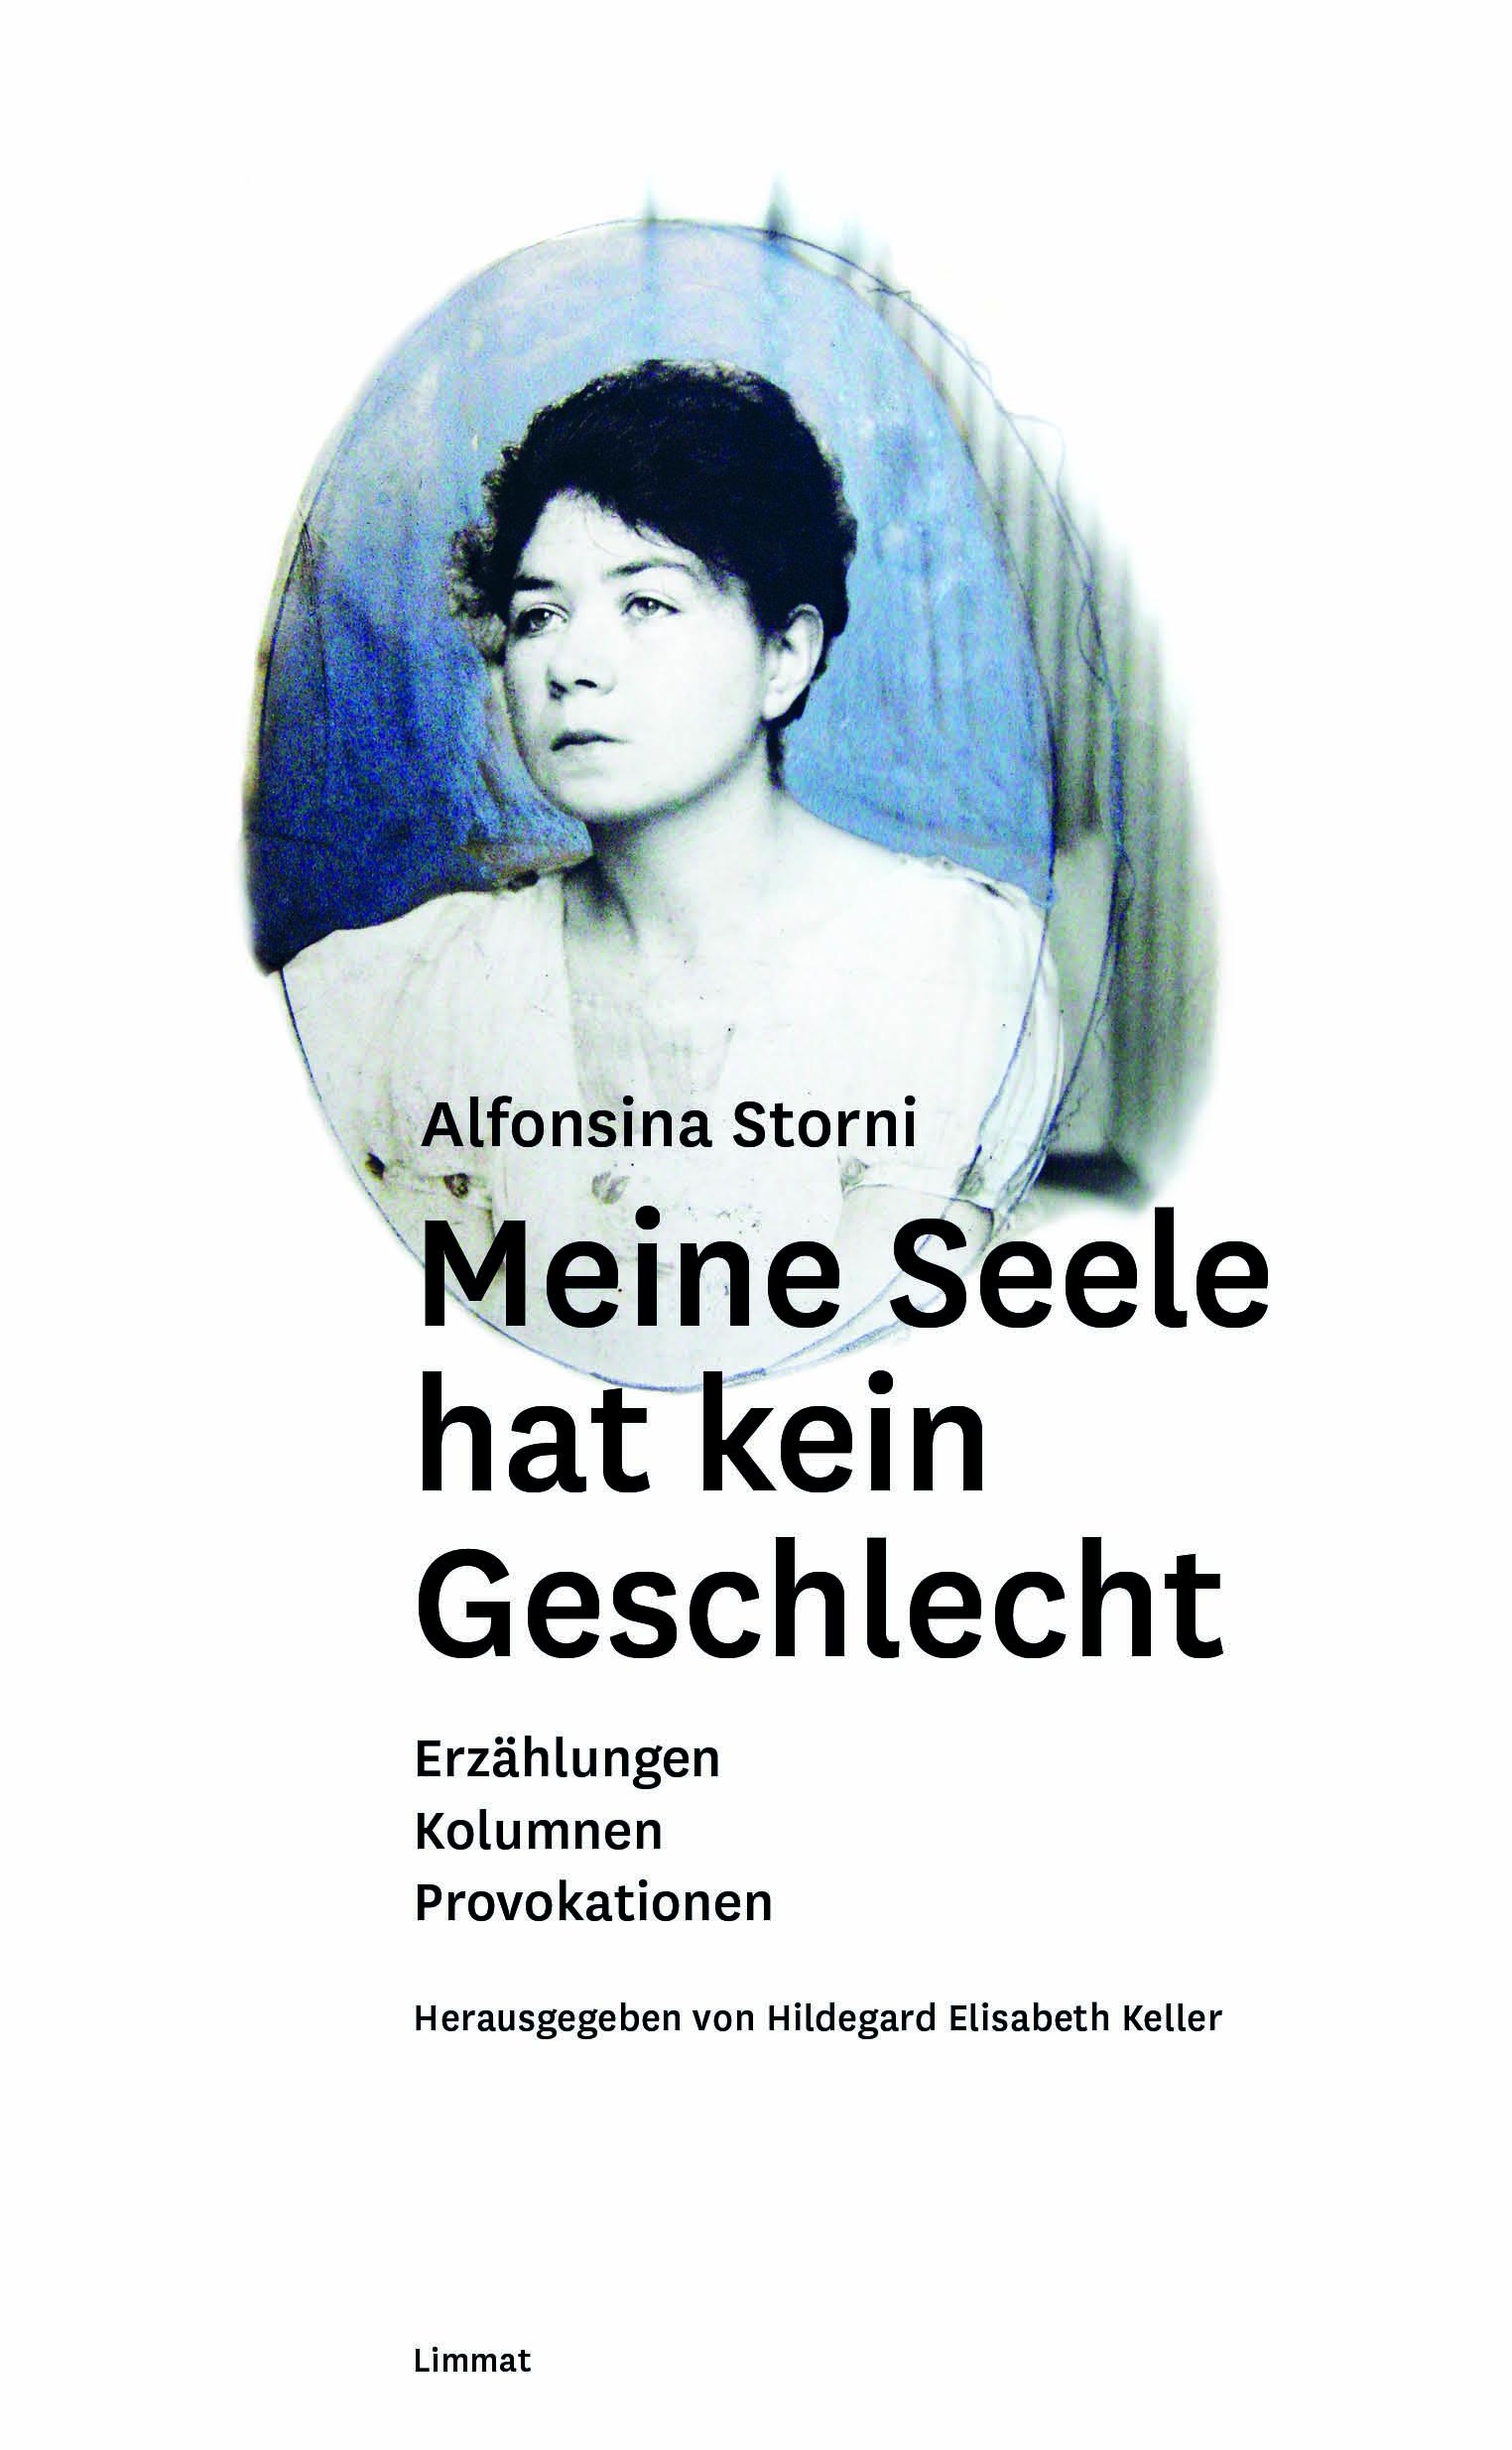 Cover Storni_Meine Seeele HEKeller 2013